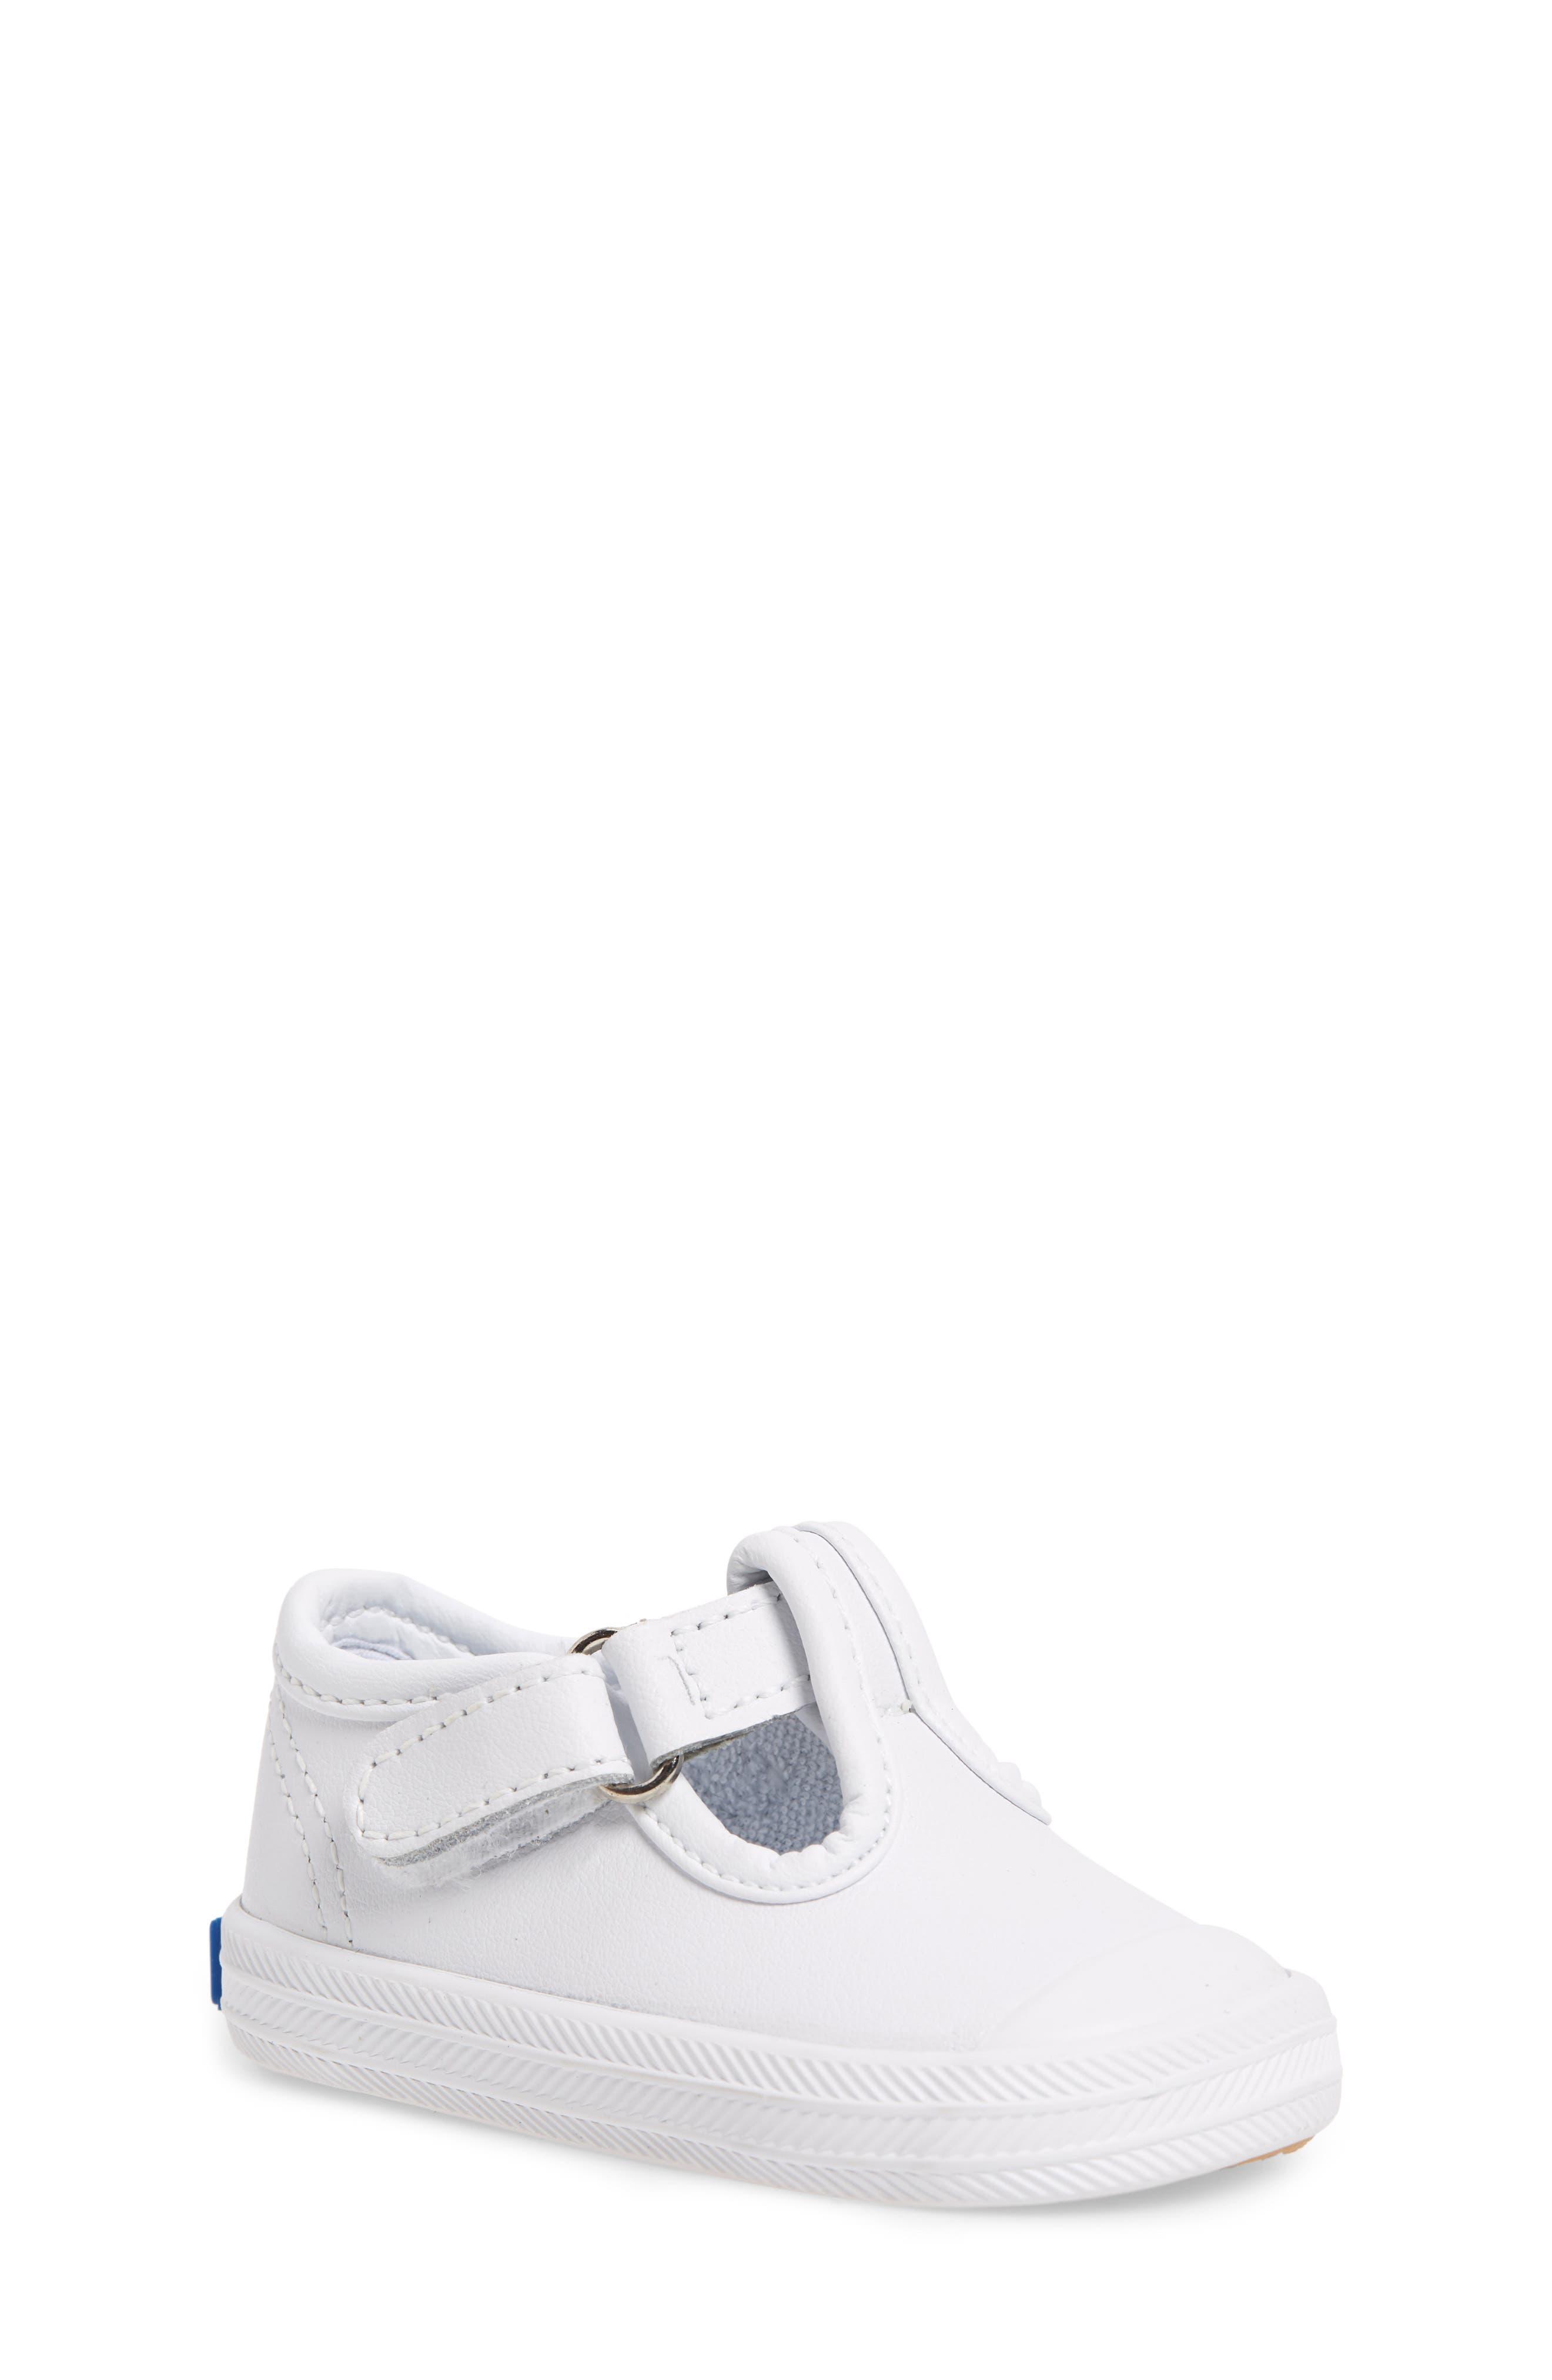 'Champion' T-Strap Shoe,                             Alternate thumbnail 2, color,                             WHITE LEATHER